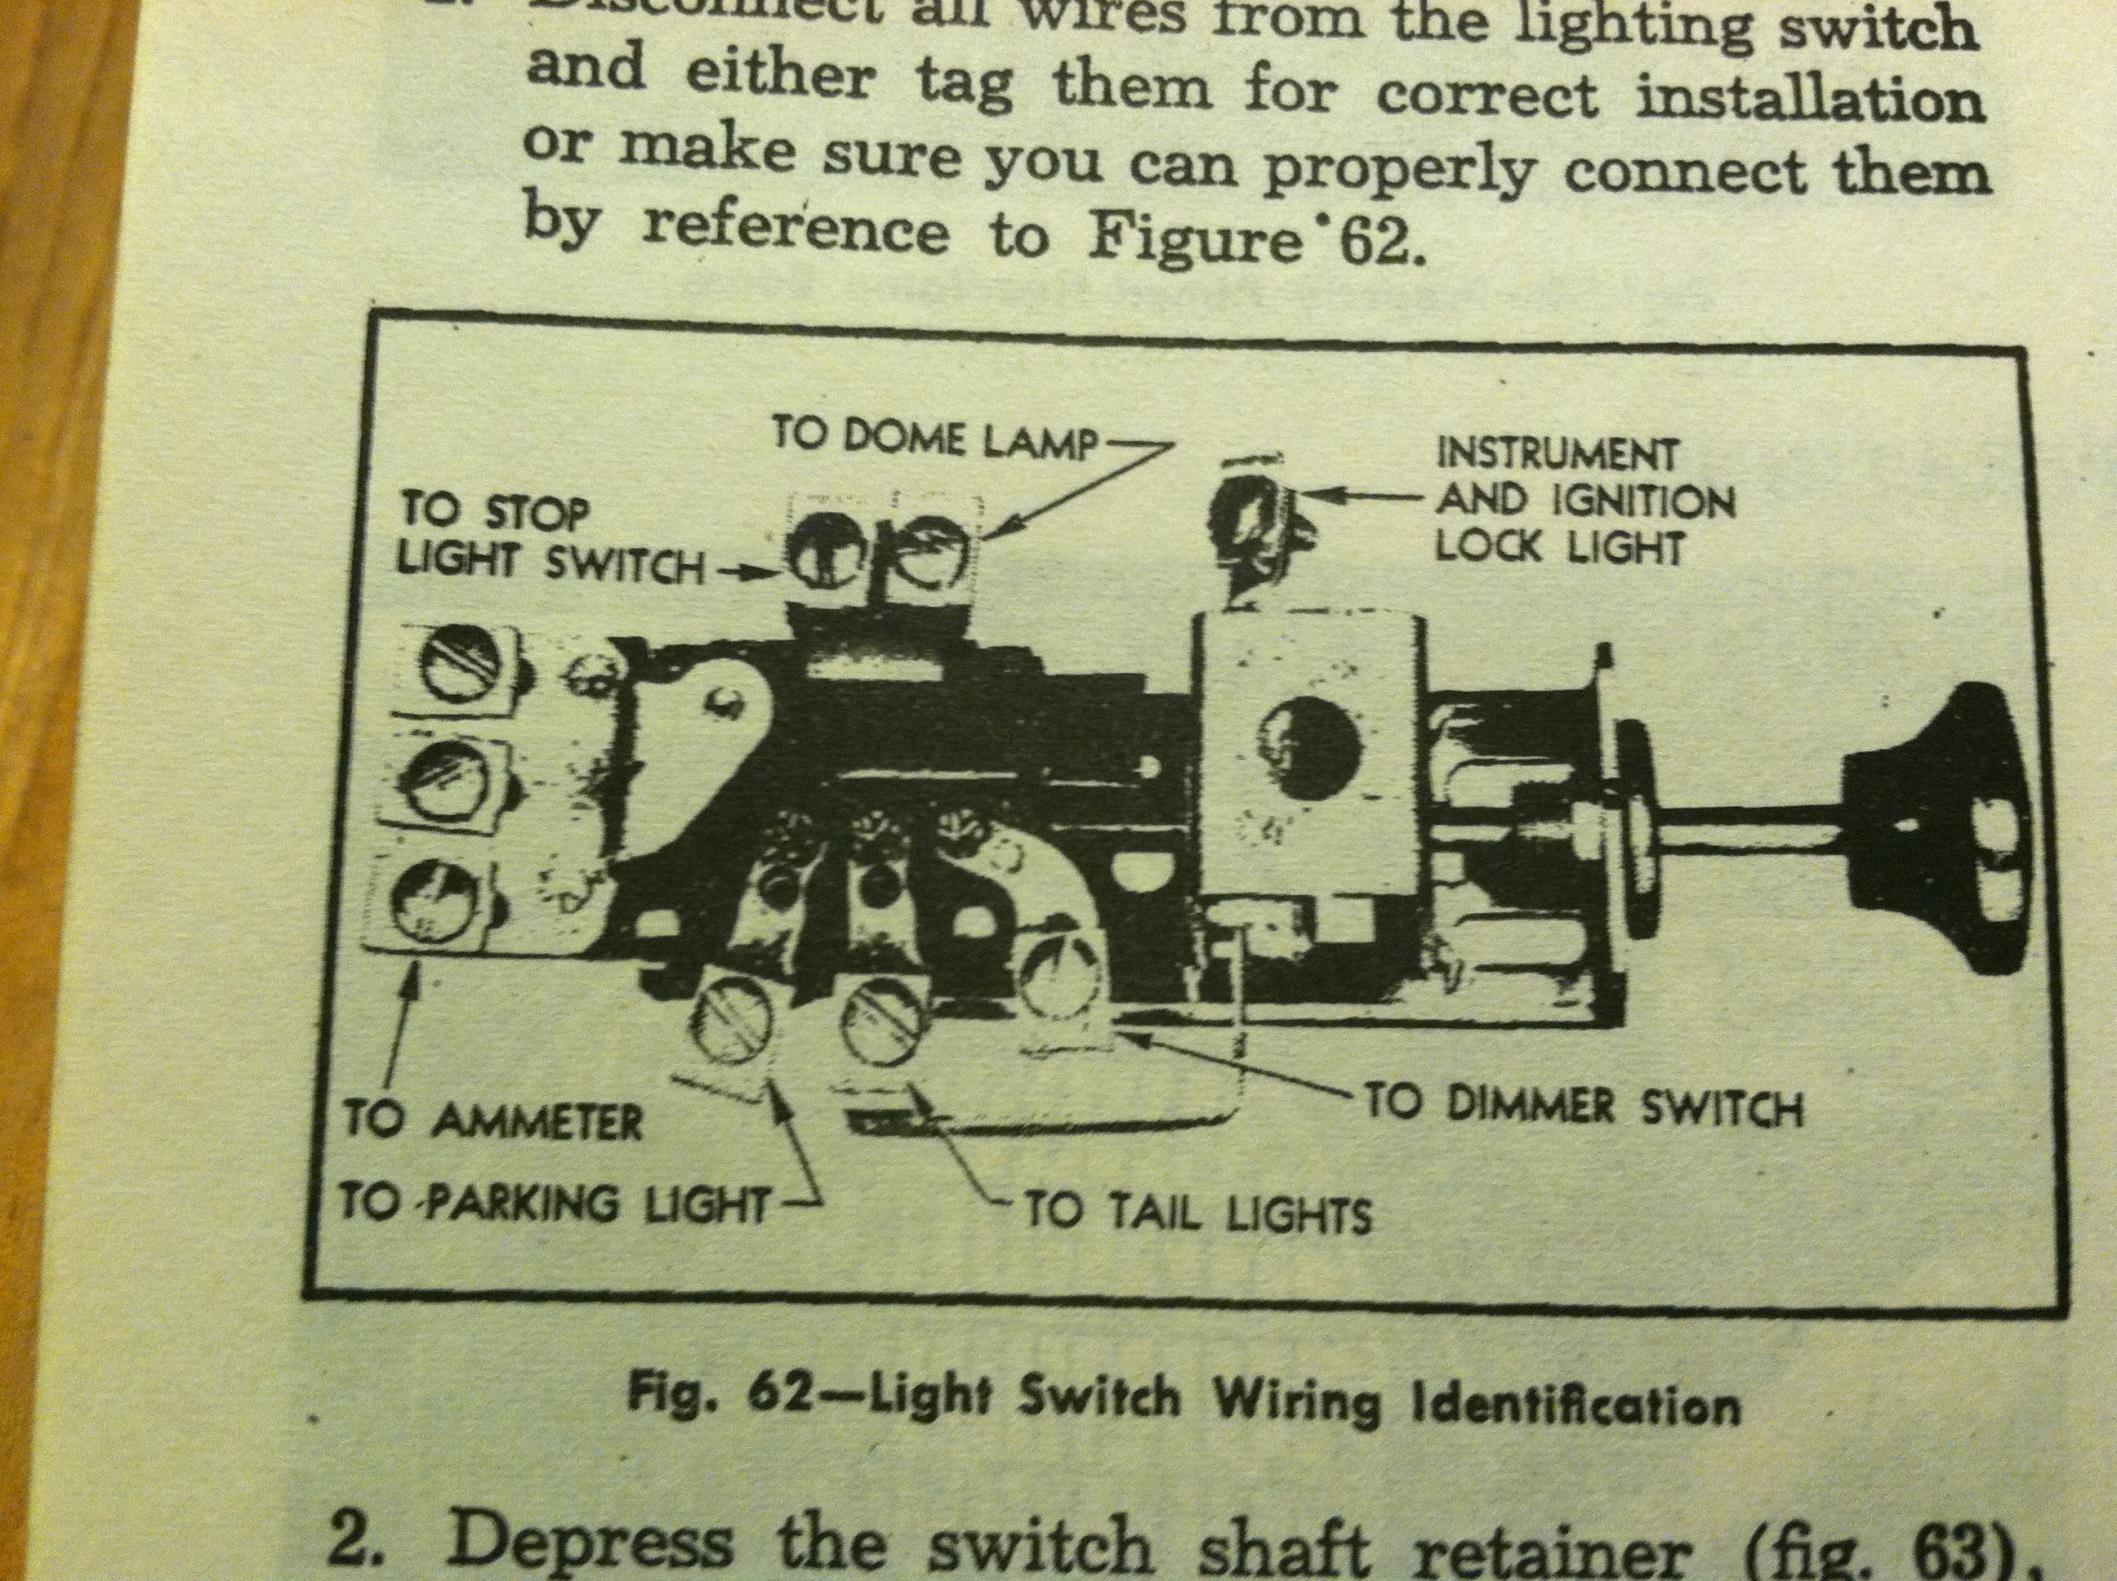 1950 Chevy Truck Headlight Switch Wiring Diagram gm ... on